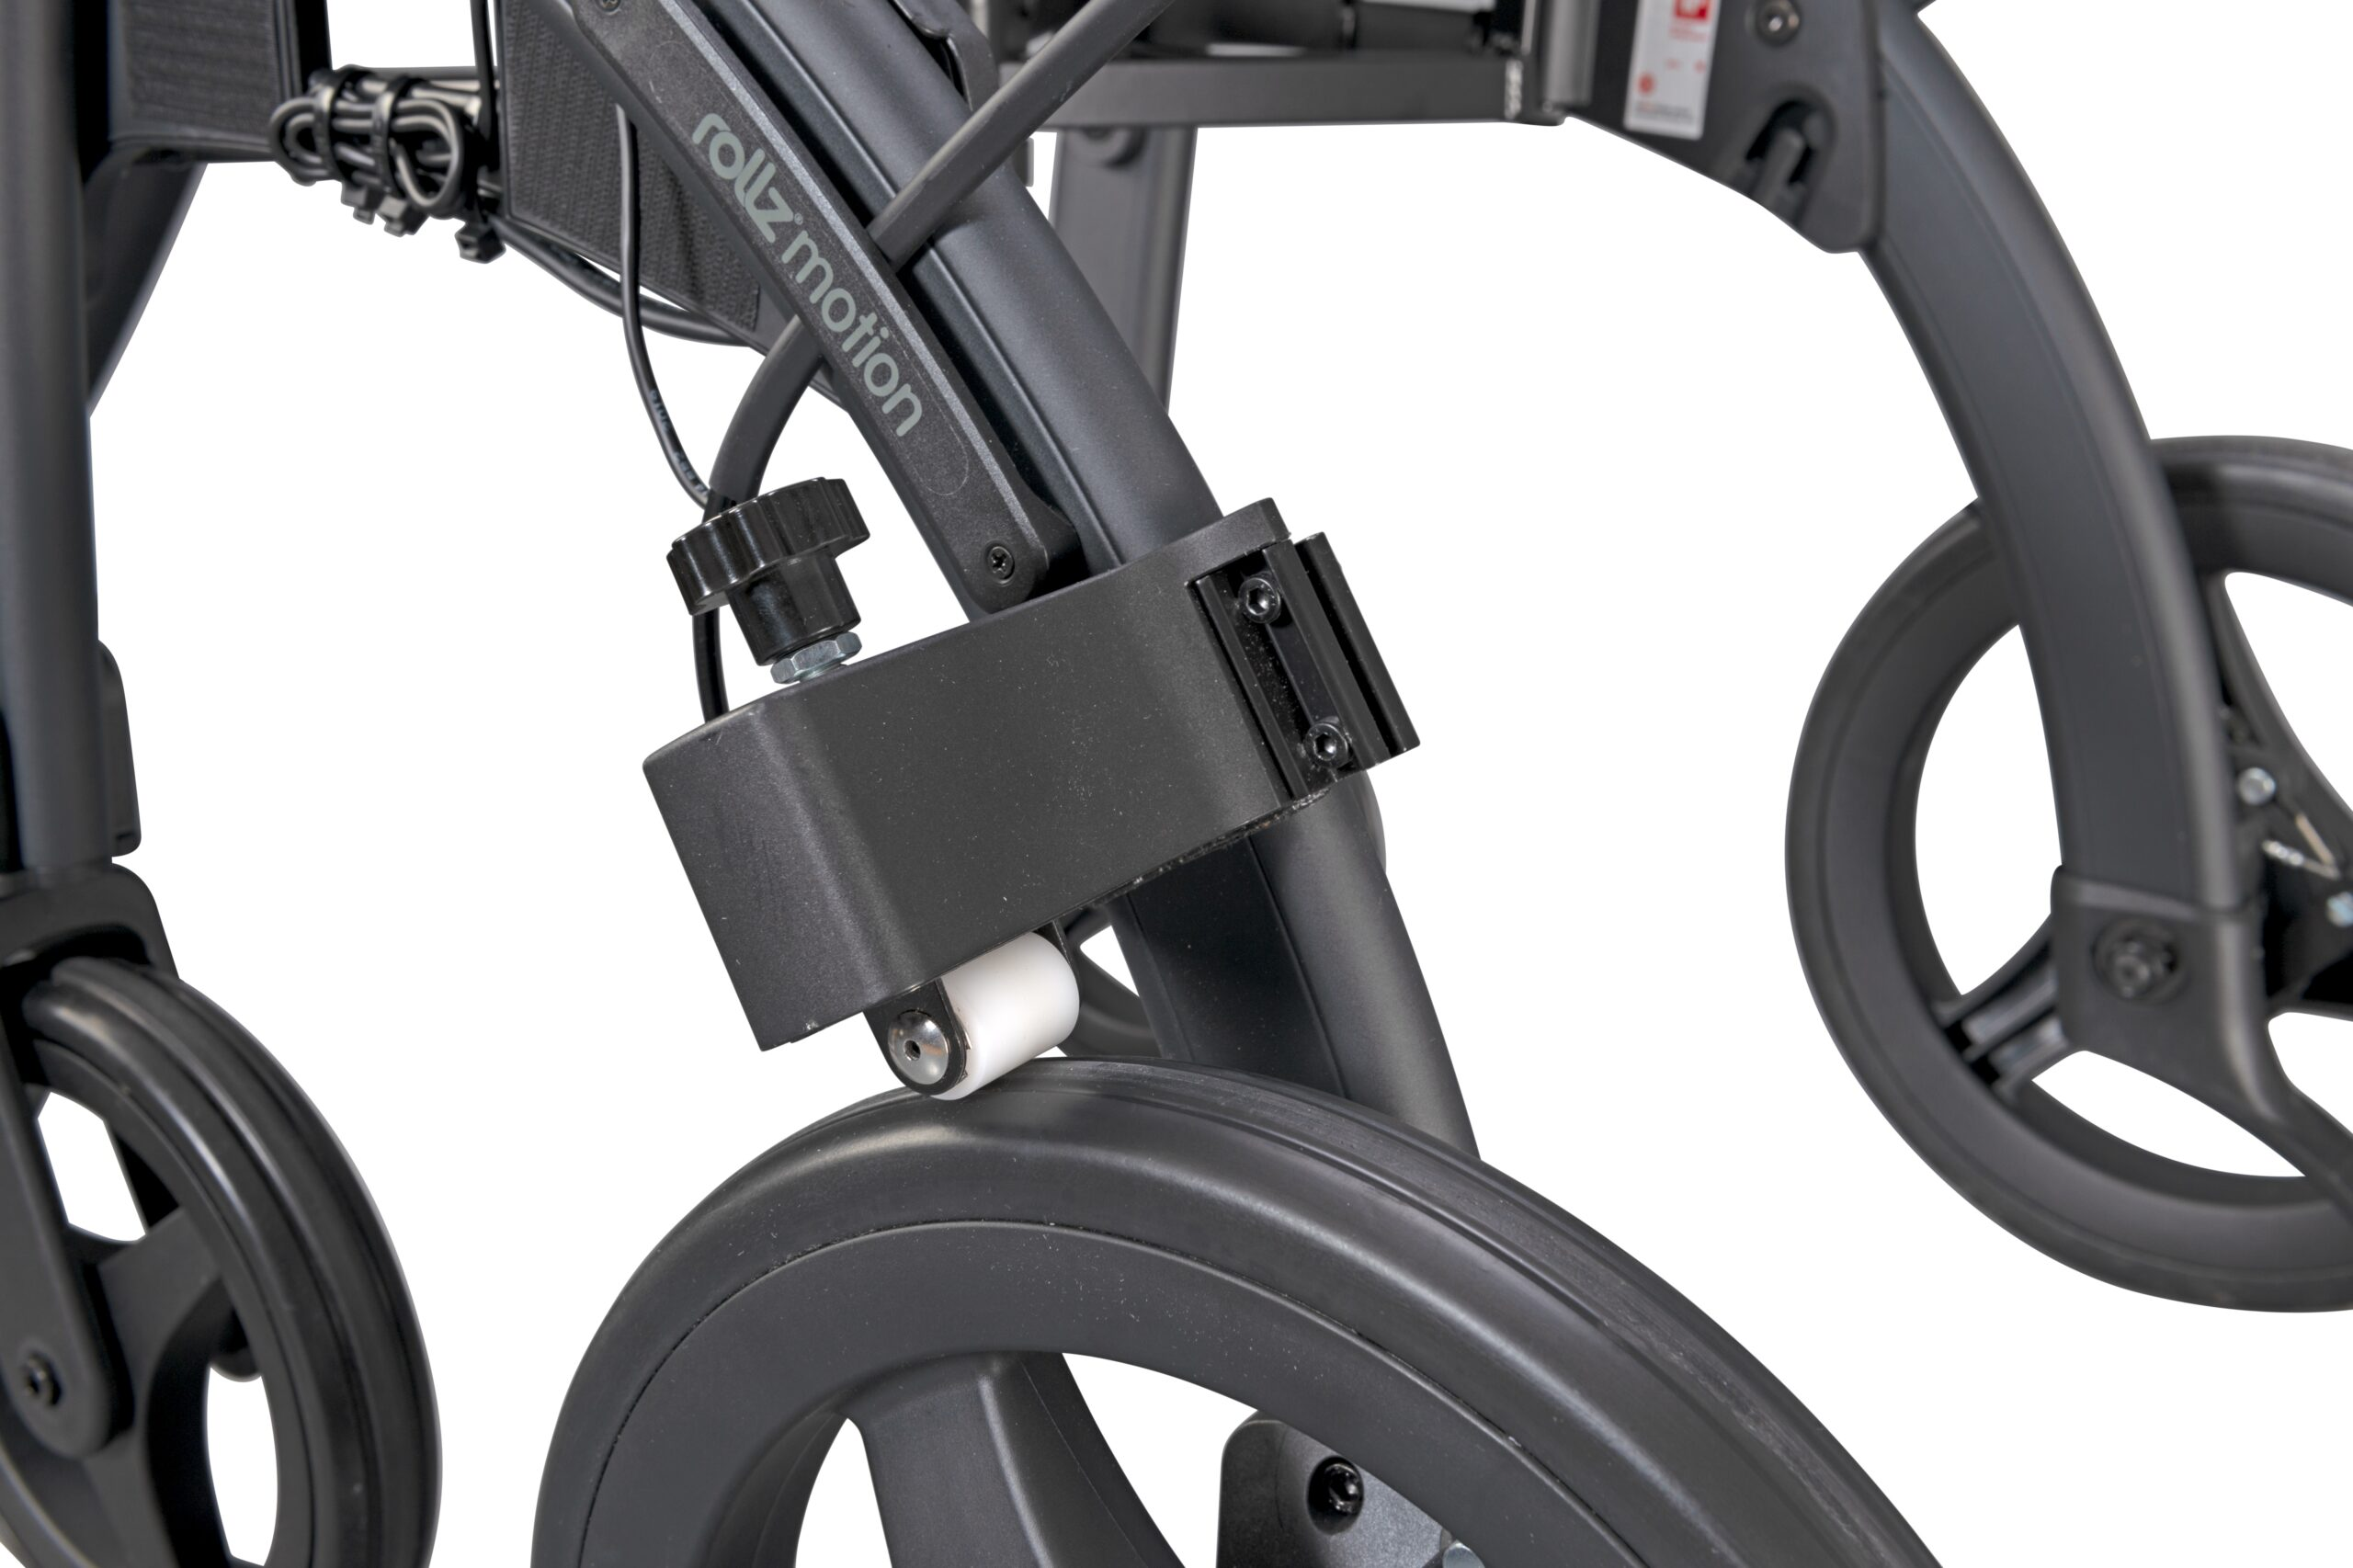 1010RM1000 Rollz Motion Rhythm slow down brakes